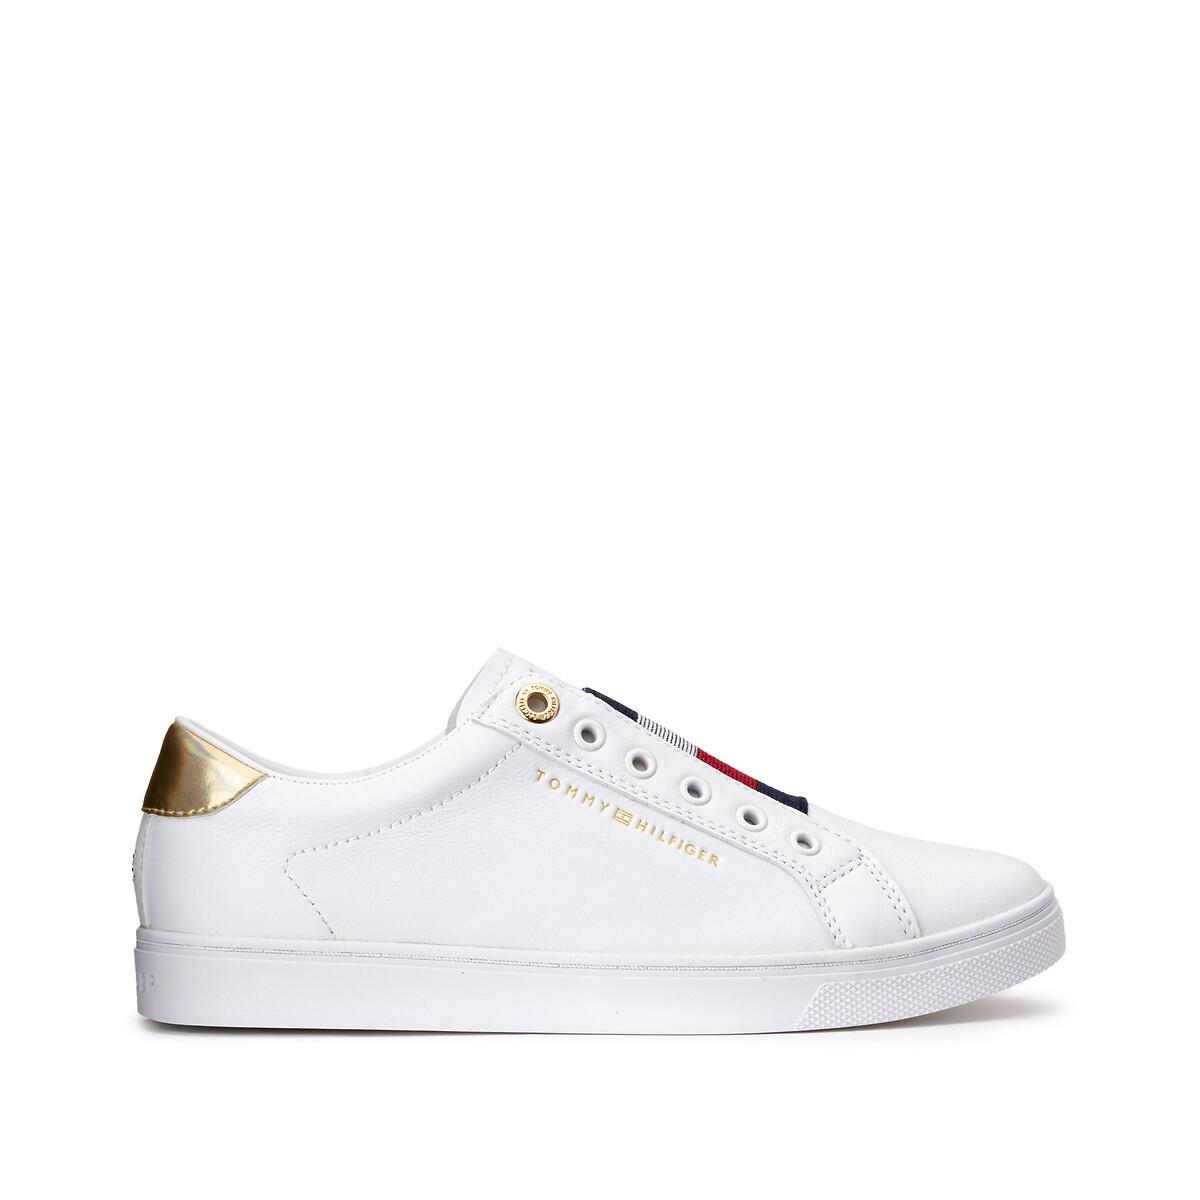 Tommy Hilfiger TH Elastic Slip On Sneaker leren sneakers wit online kopen